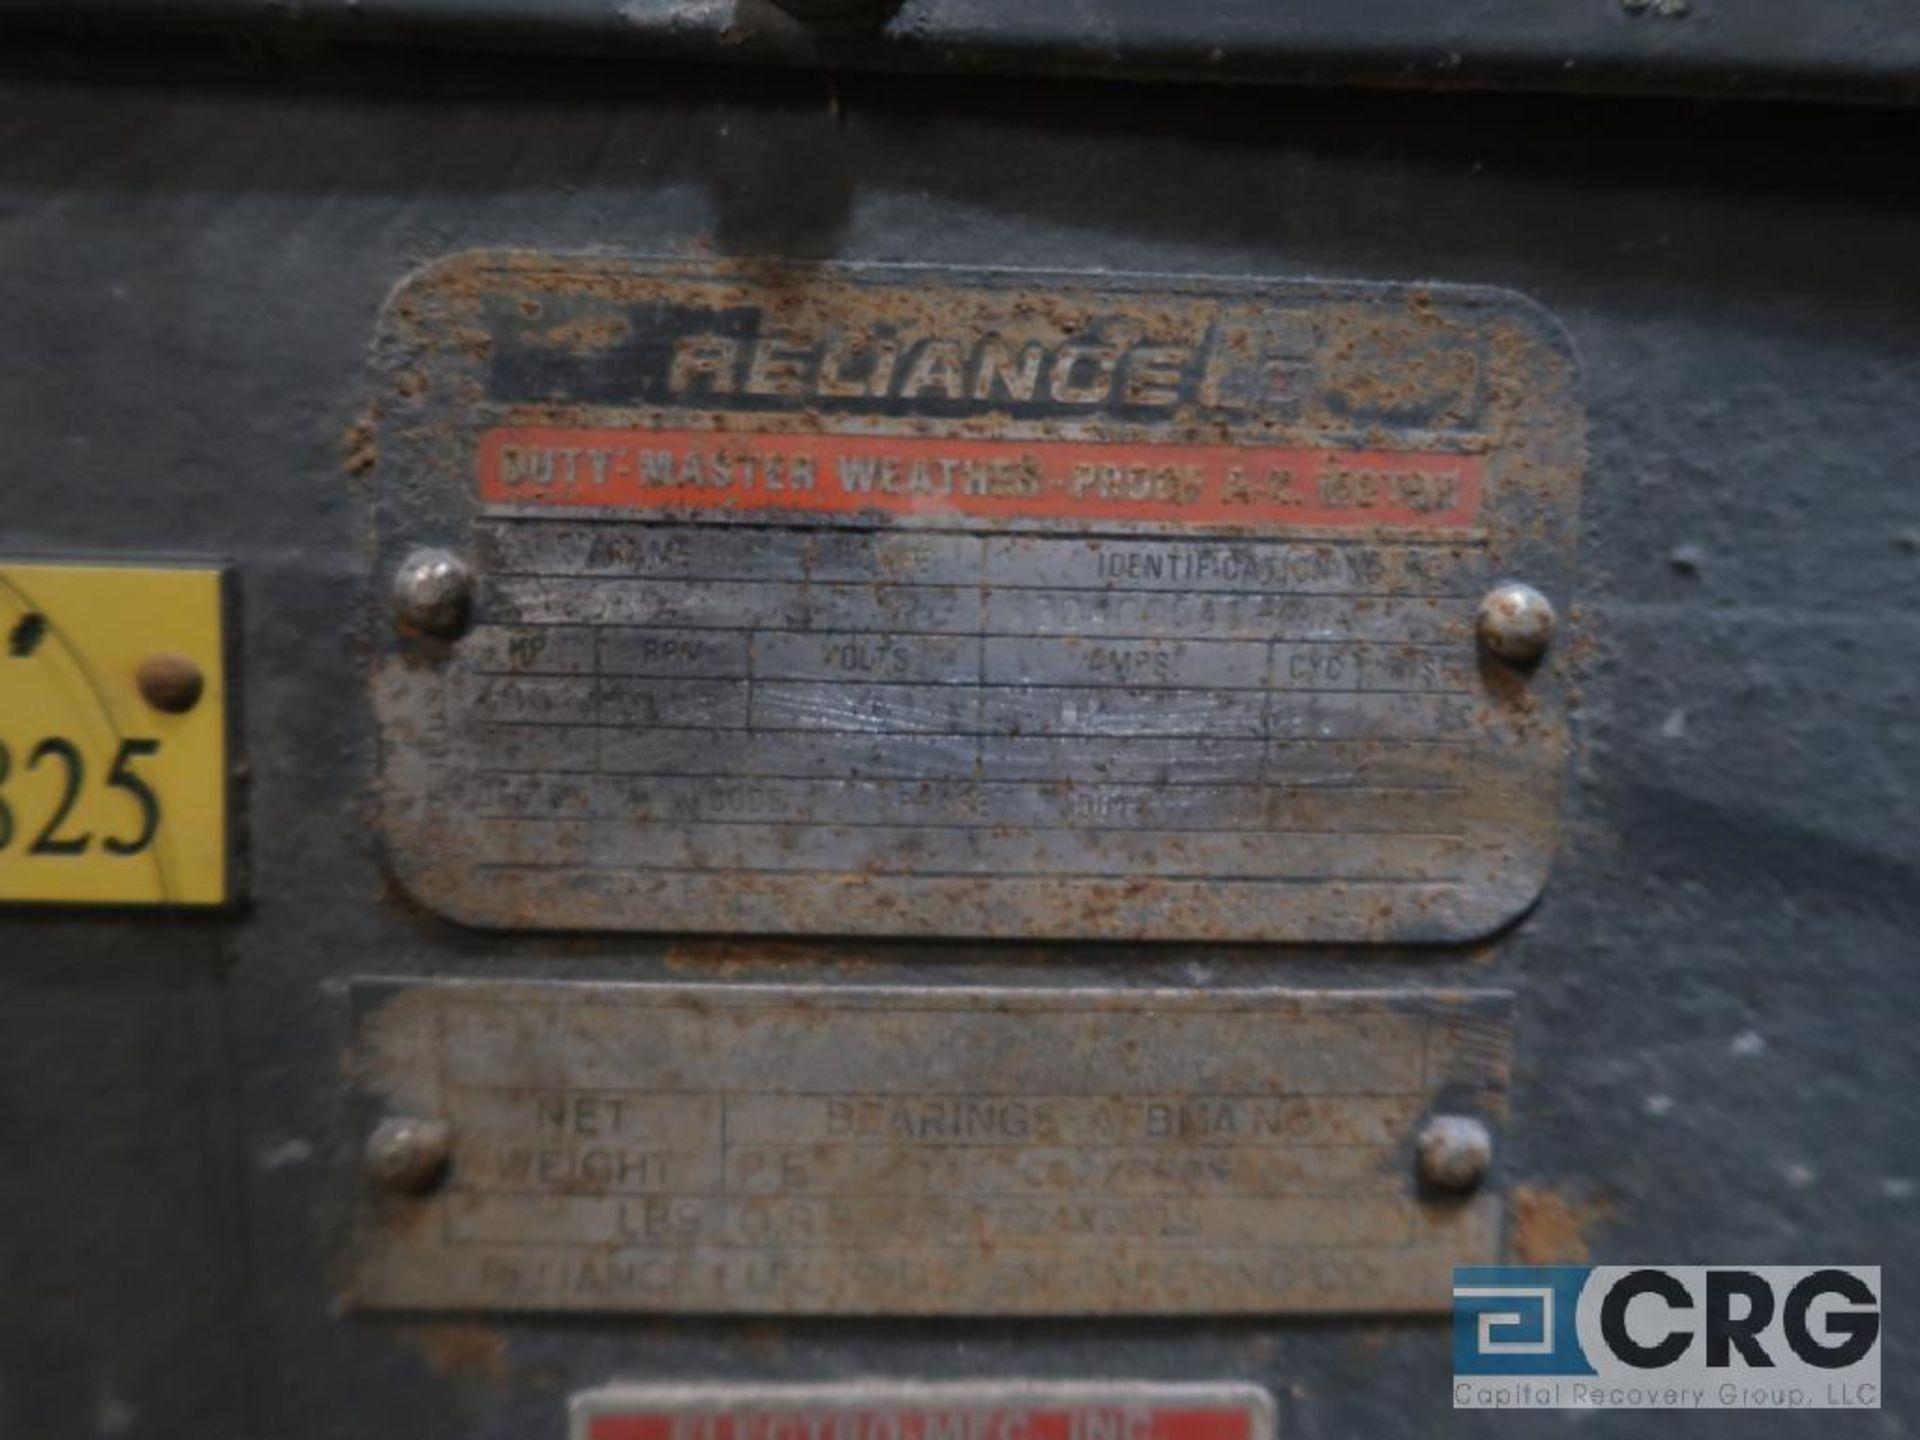 Reliance motor, 400 HP, 1,185 RPM, 2,600 volt, equipment #E00825 (496 Dock Area) - Image 2 of 2